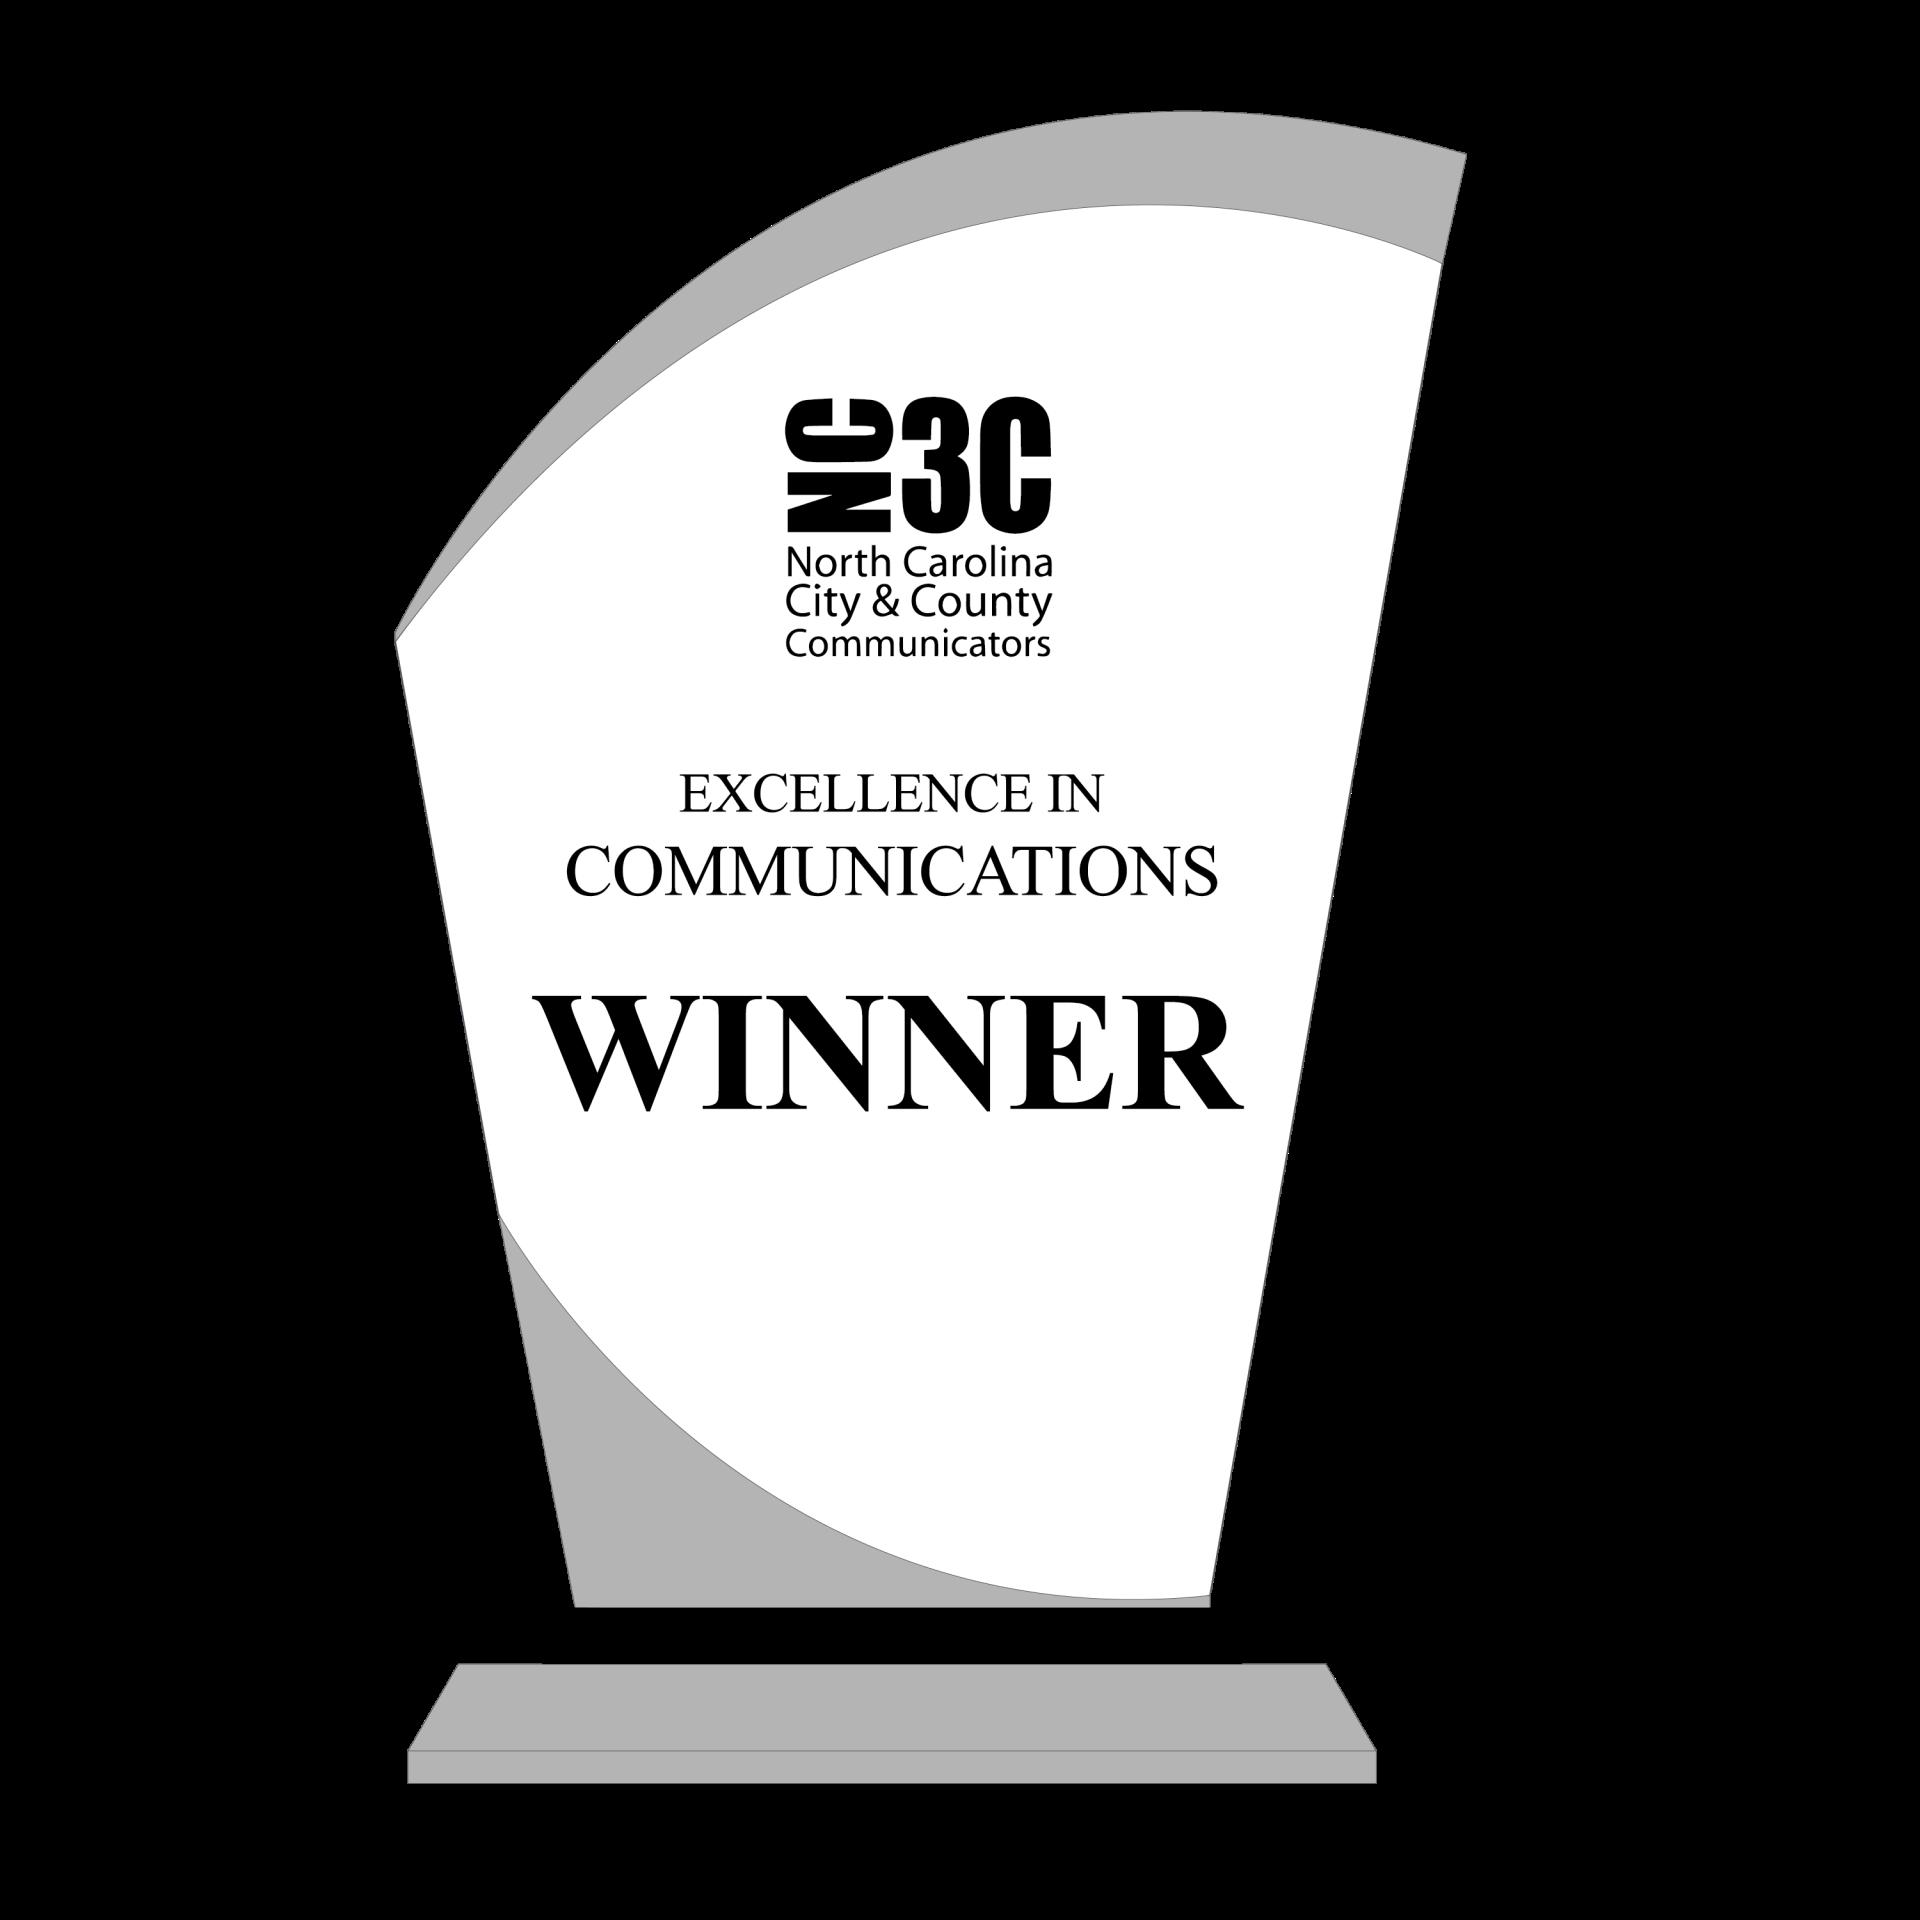 NC3C Award